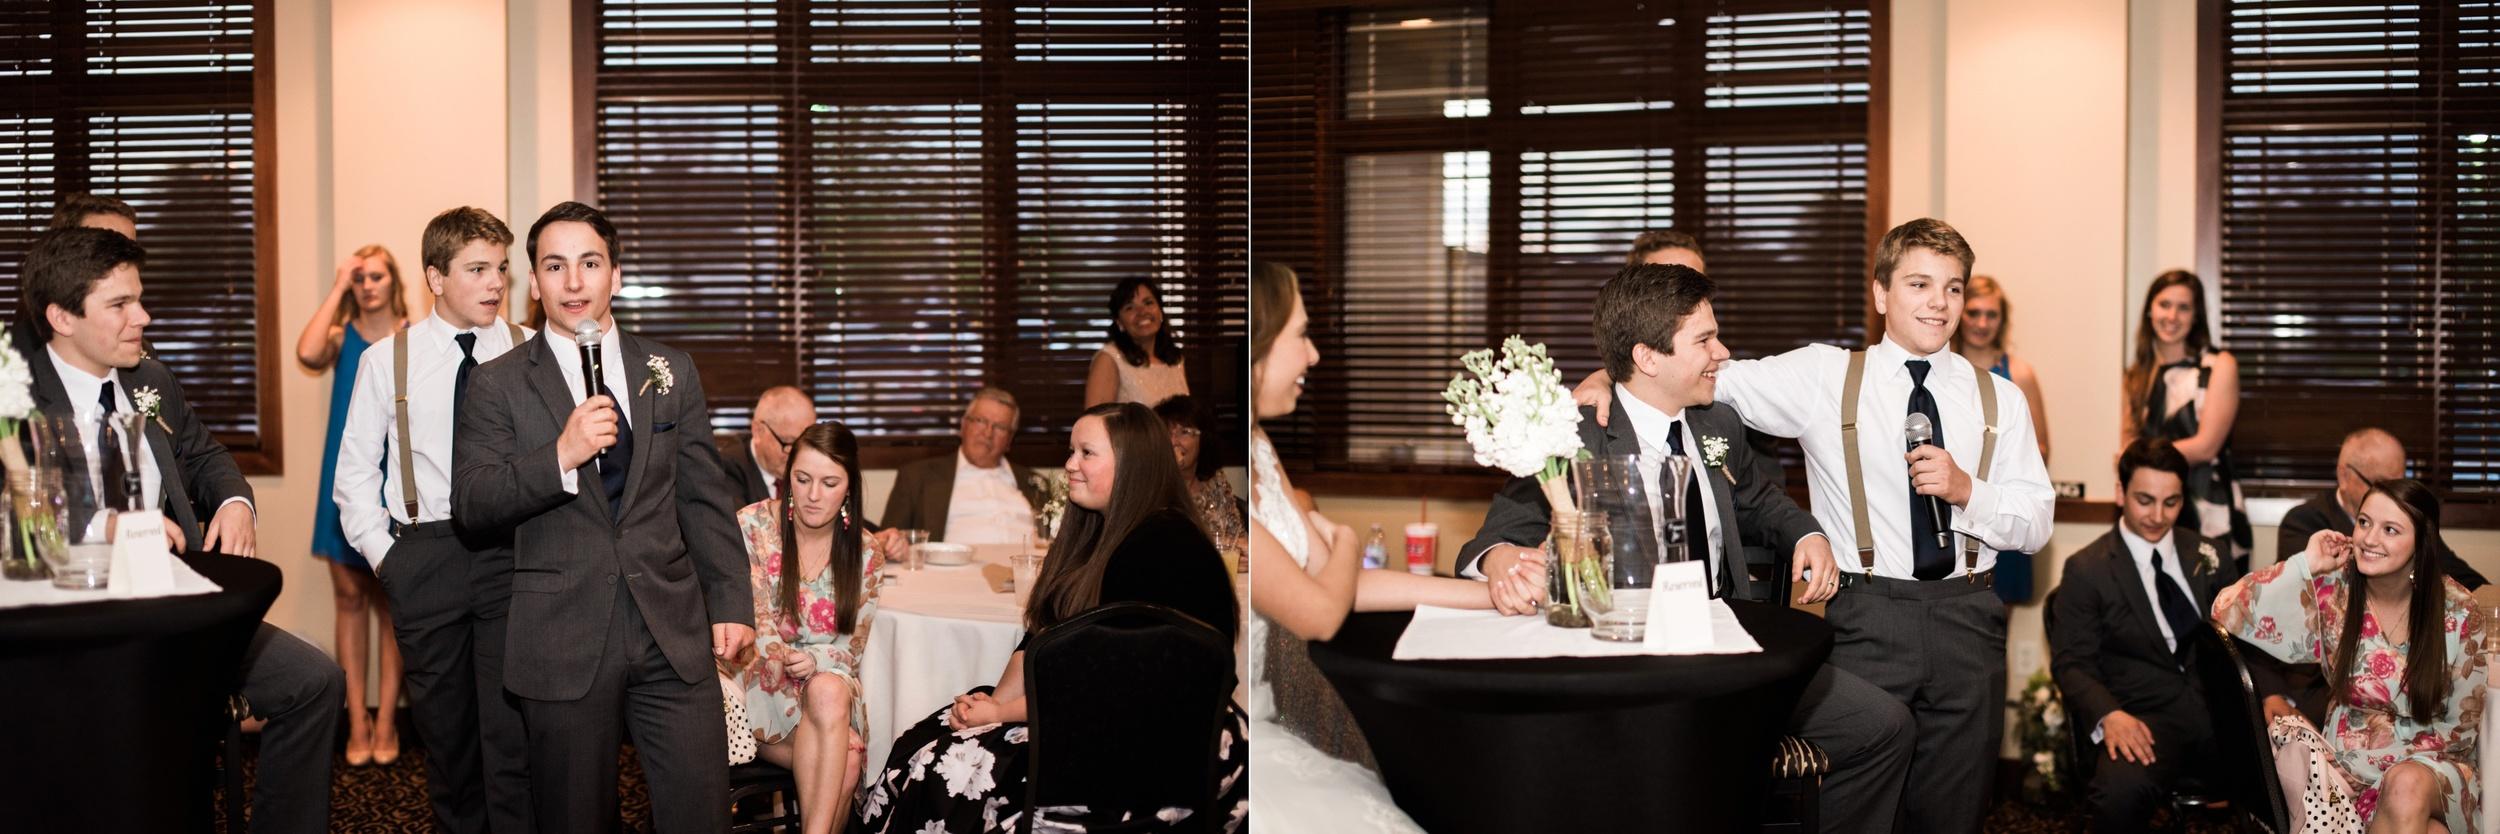 Pleasant Hill Des Moines Wedding Photographer_2183.jpg